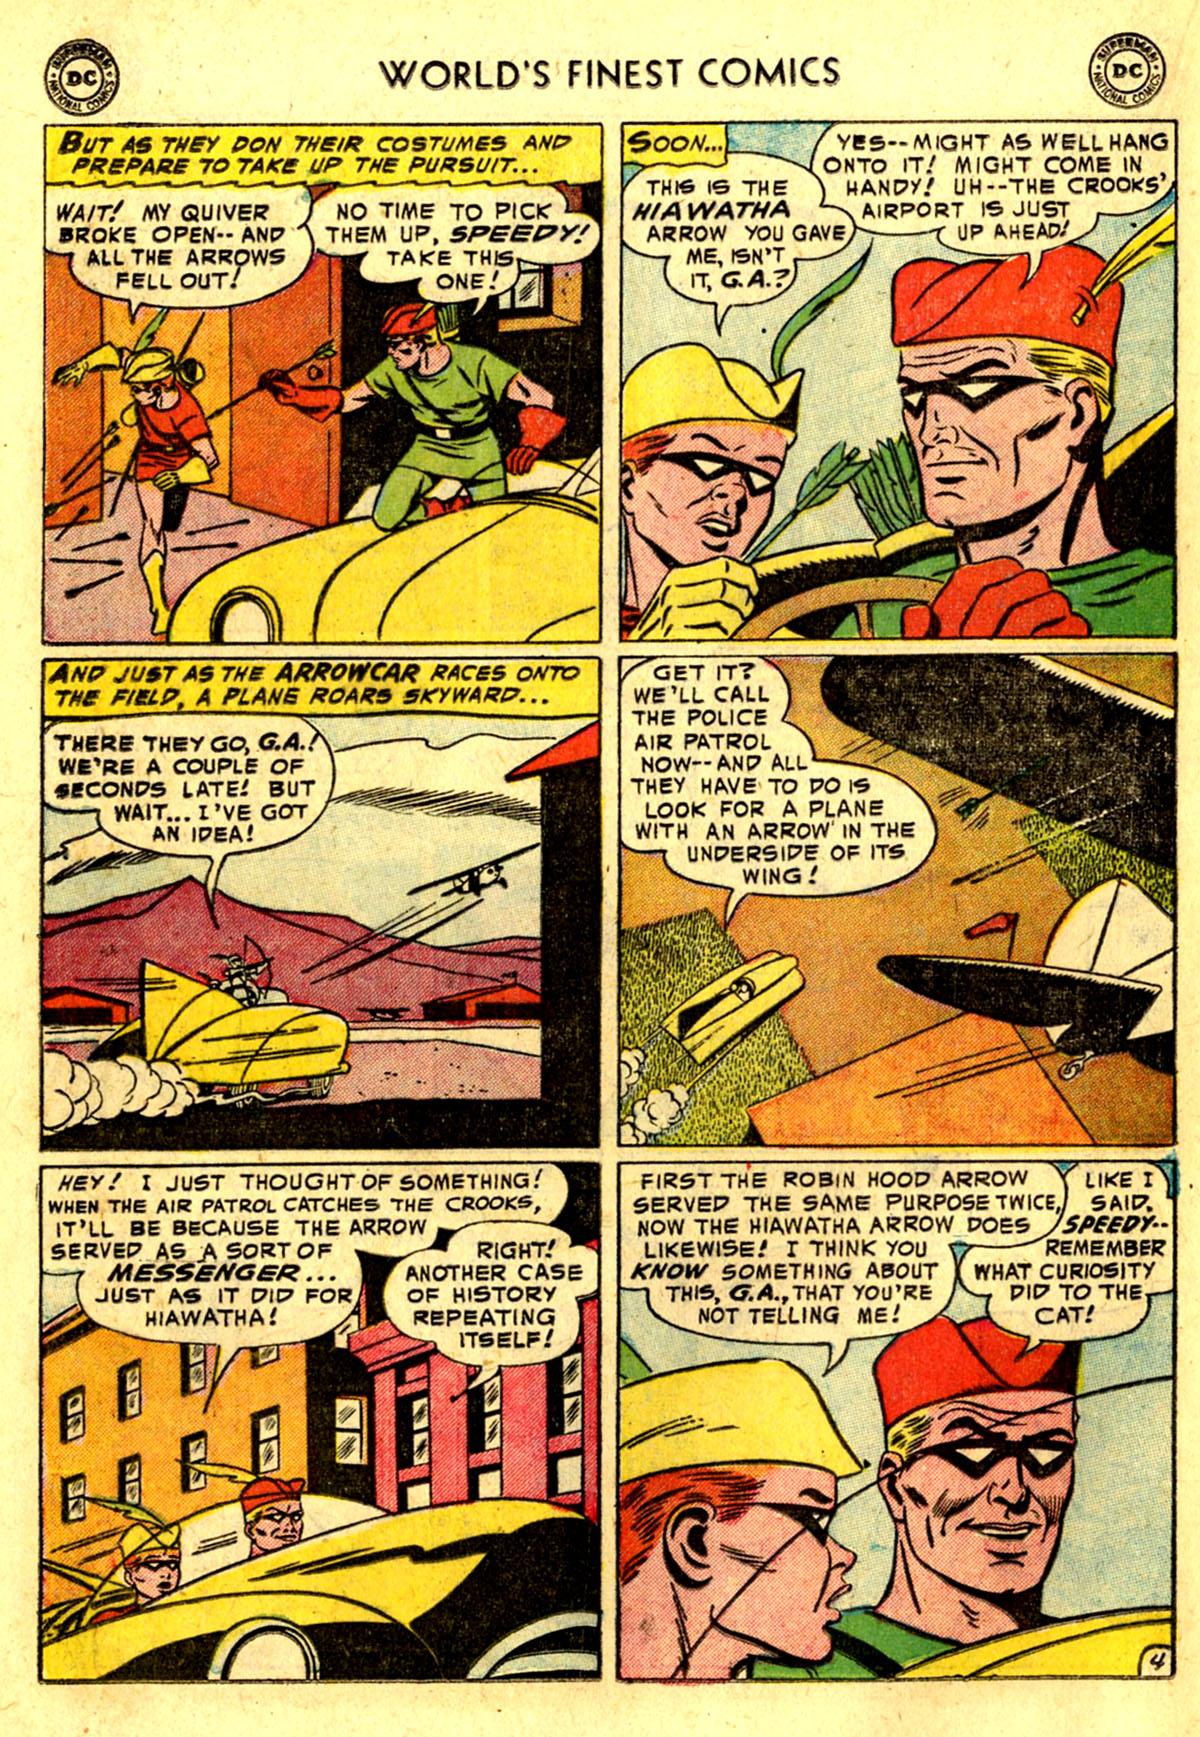 Read online World's Finest Comics comic -  Issue #75 - 20